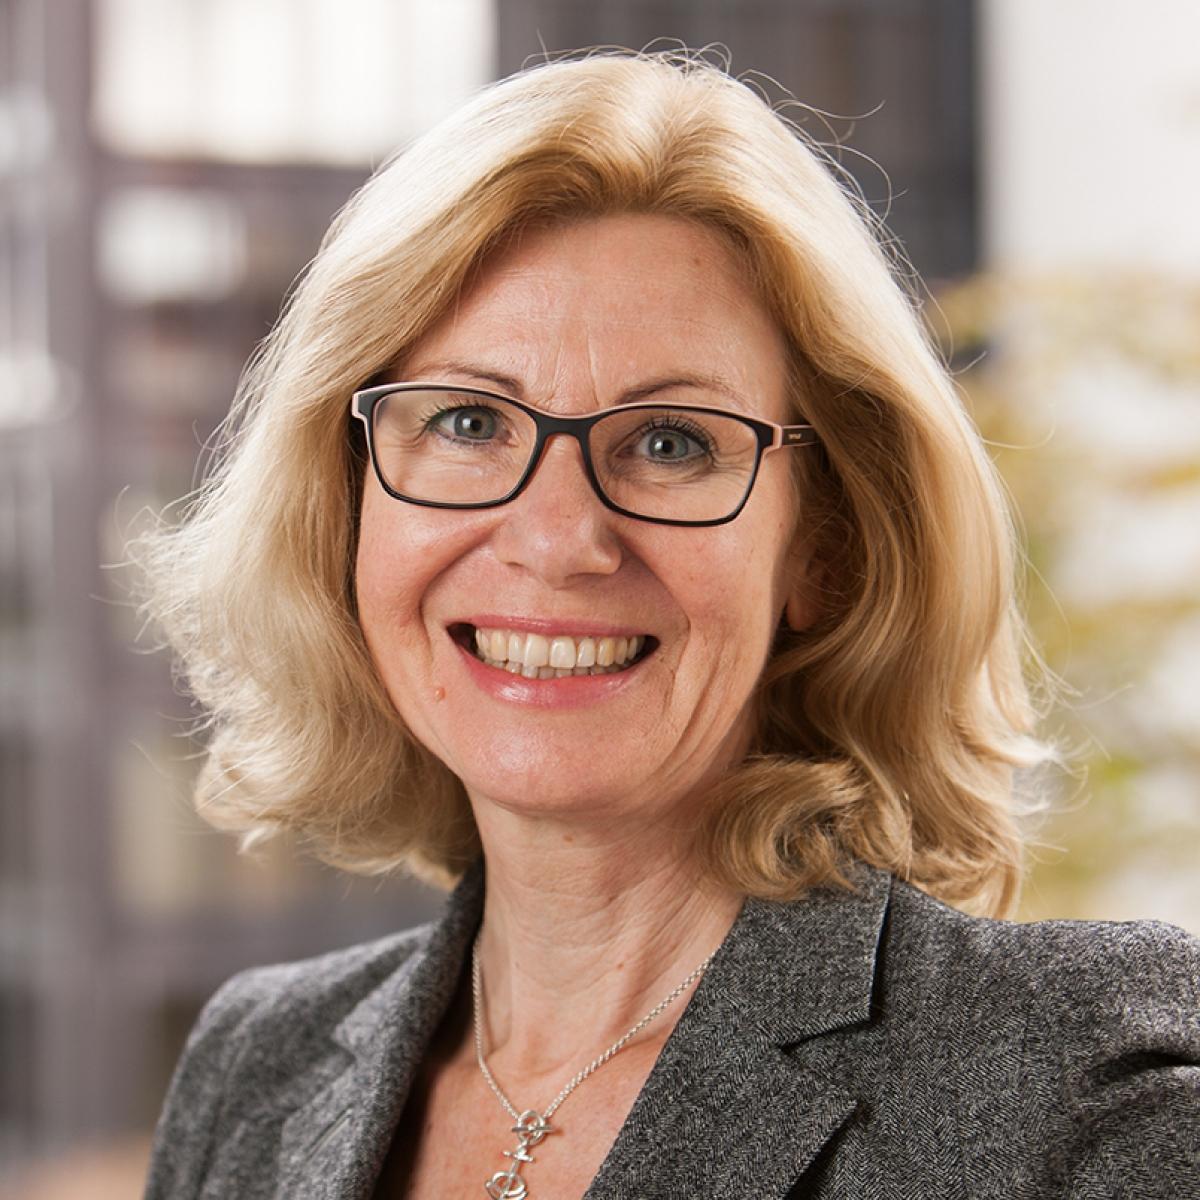 Sabine Seedorf